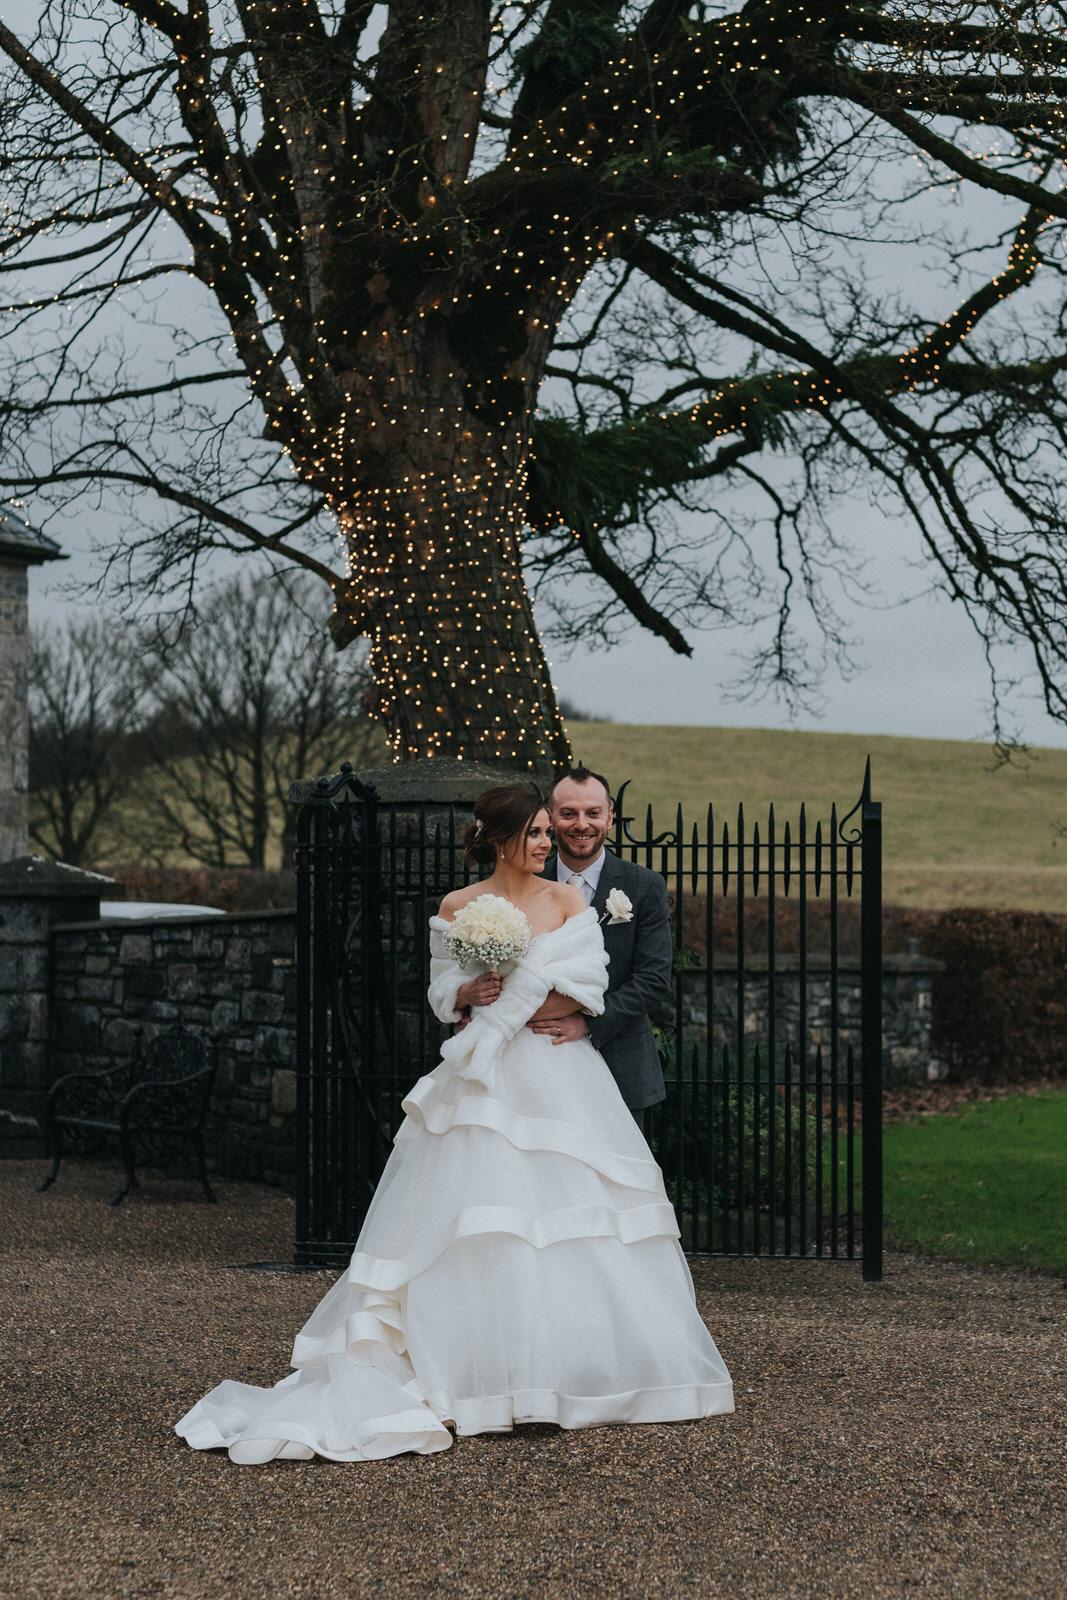 Clonabreany_wedding-photographer_roger_kenny_ireland_074.jpg